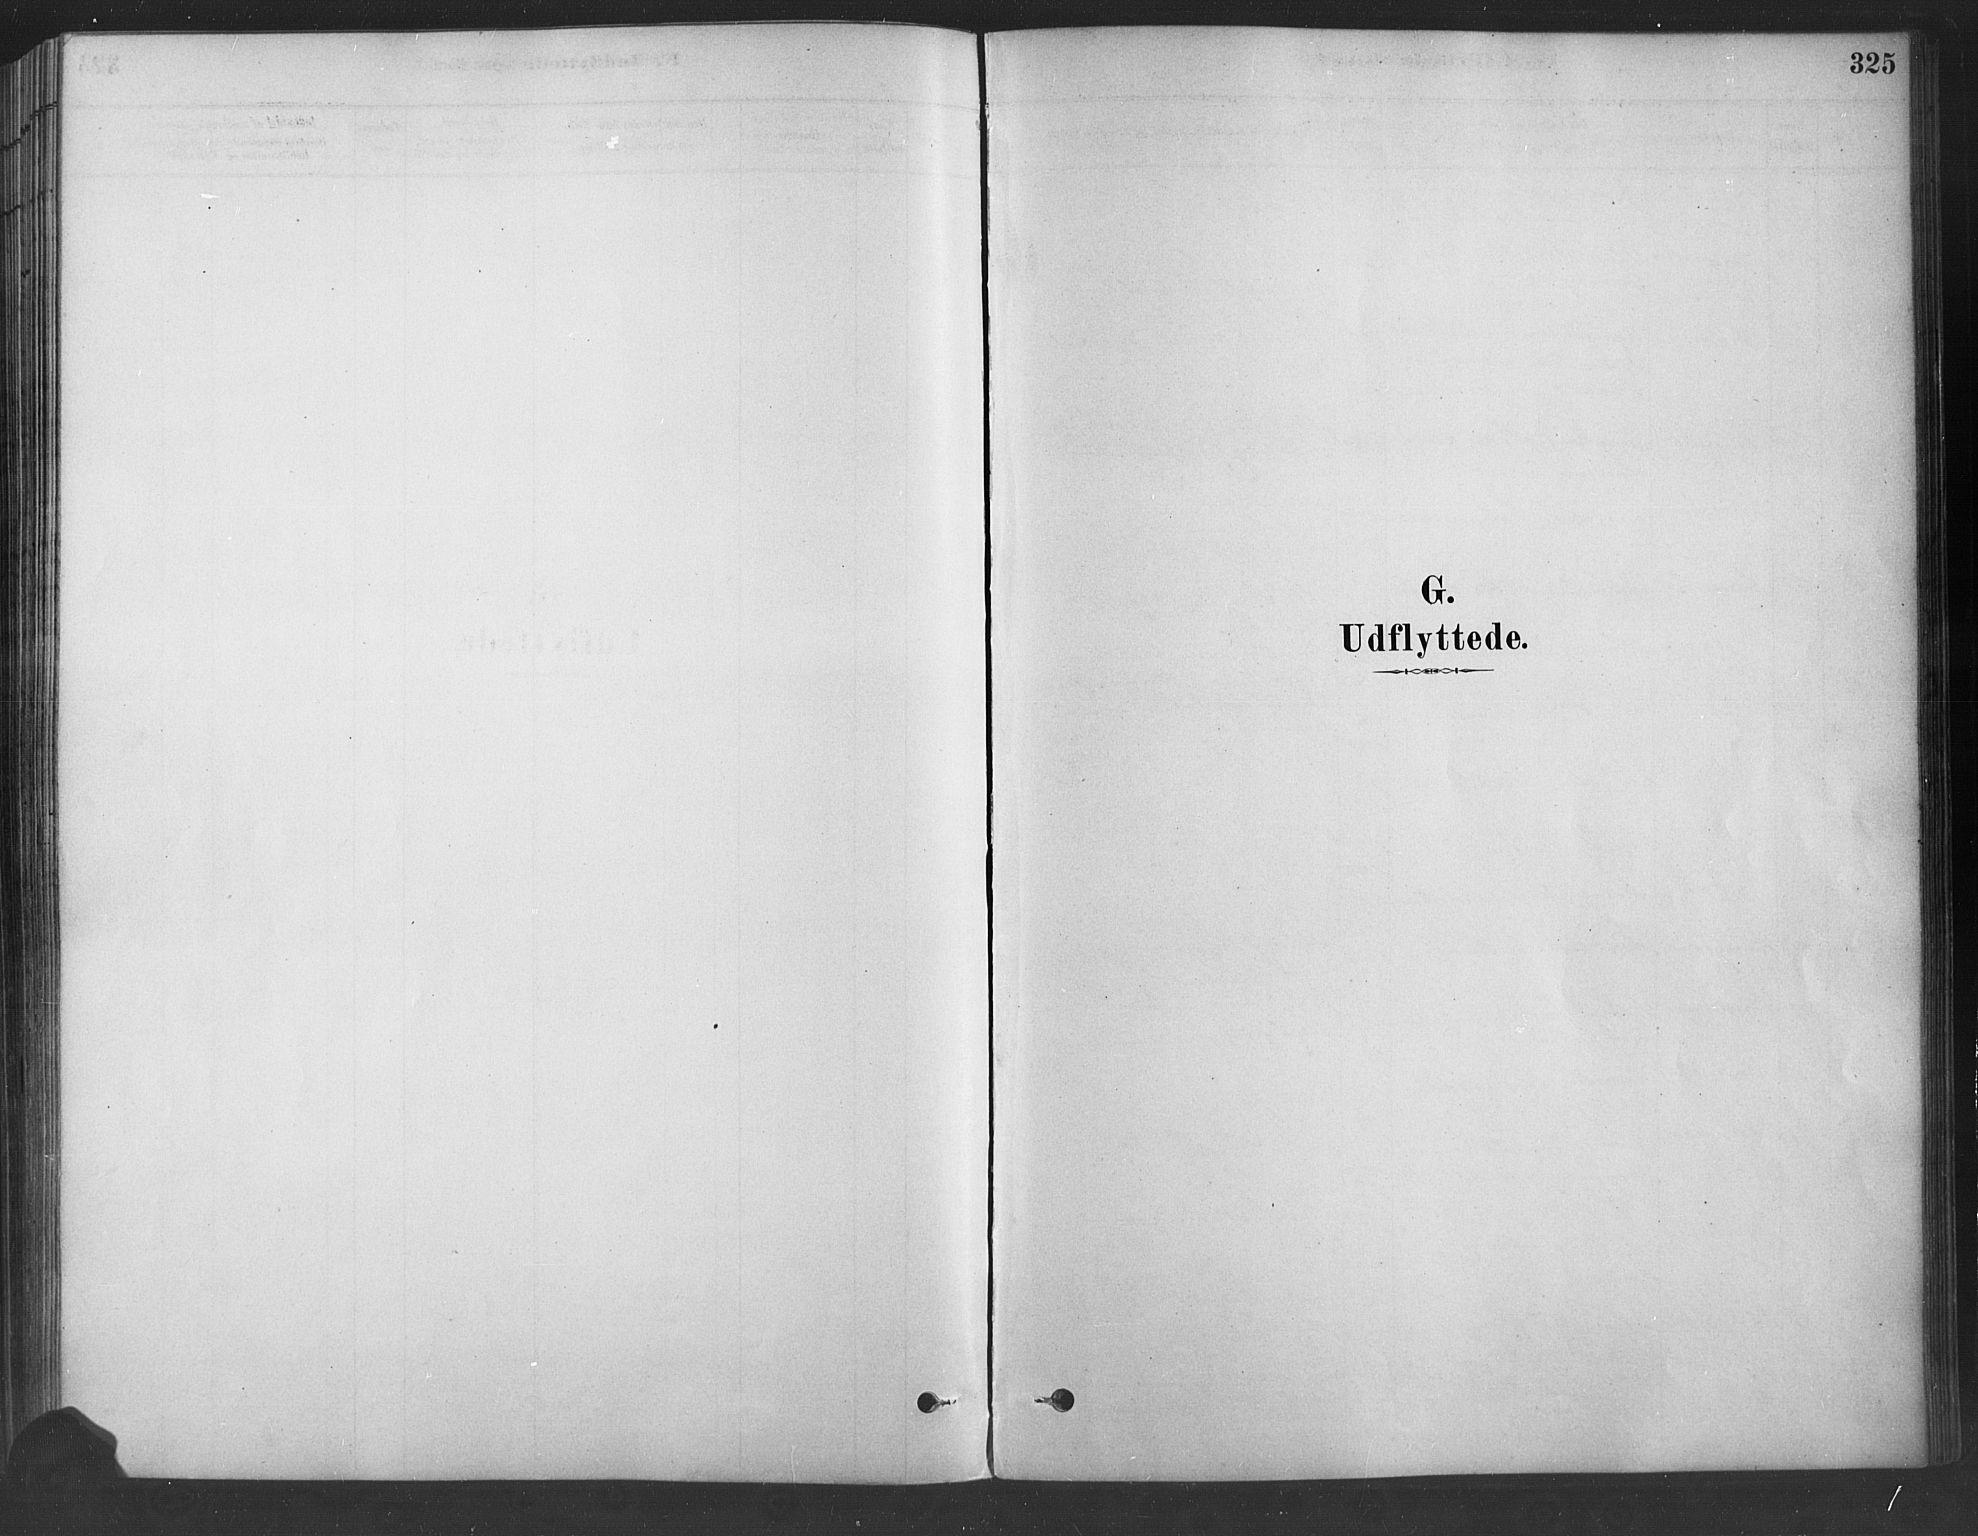 SAH, Fåberg prestekontor, H/Ha/Haa/L0009: Parish register (official) no. 9, 1879-1898, p. 325